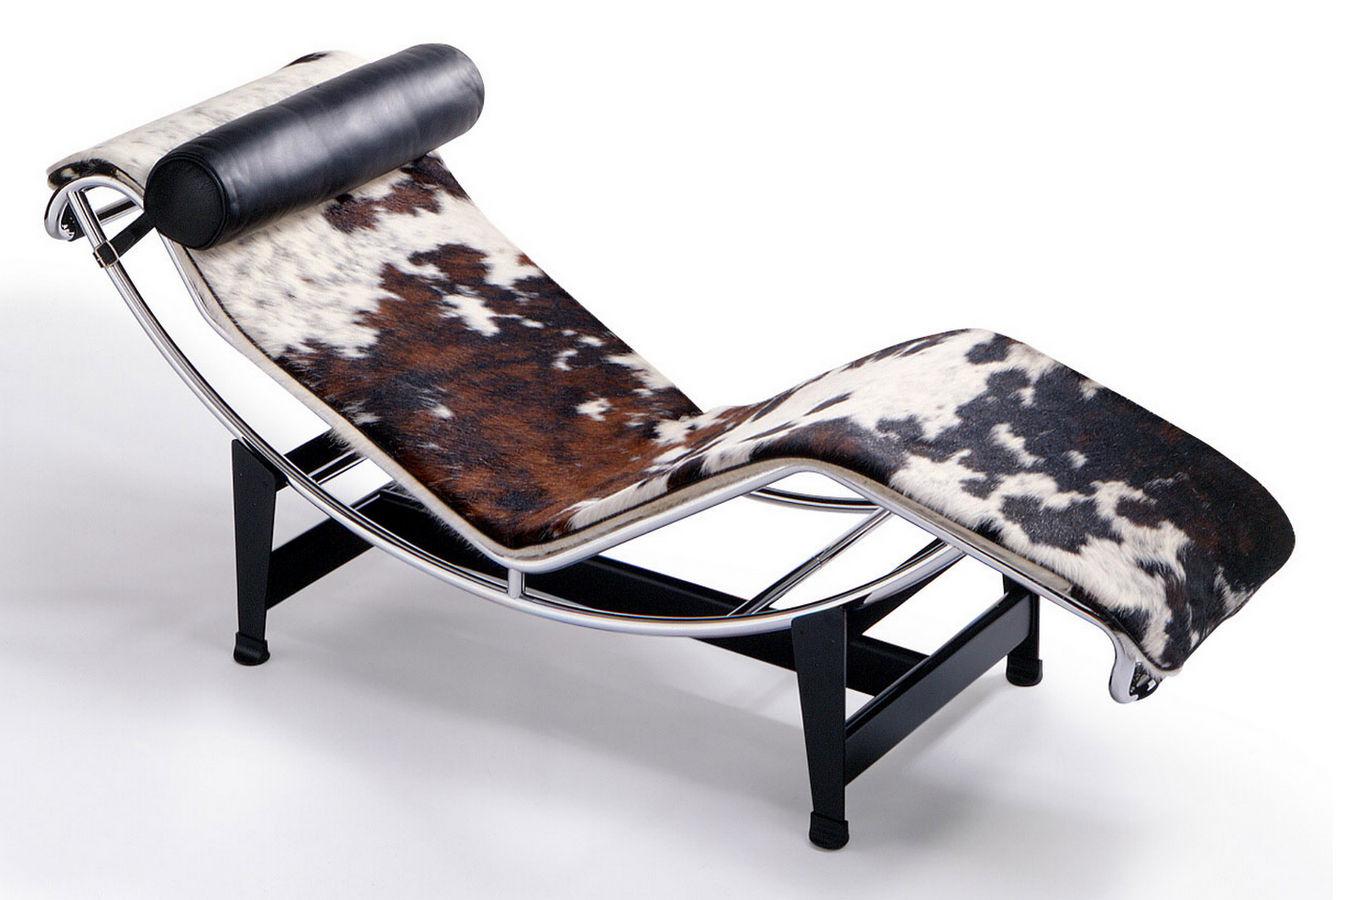 Imitazioni Lampade Design Of Chaise Longue Bascule Cr E Par Le Corbusier Charlotte